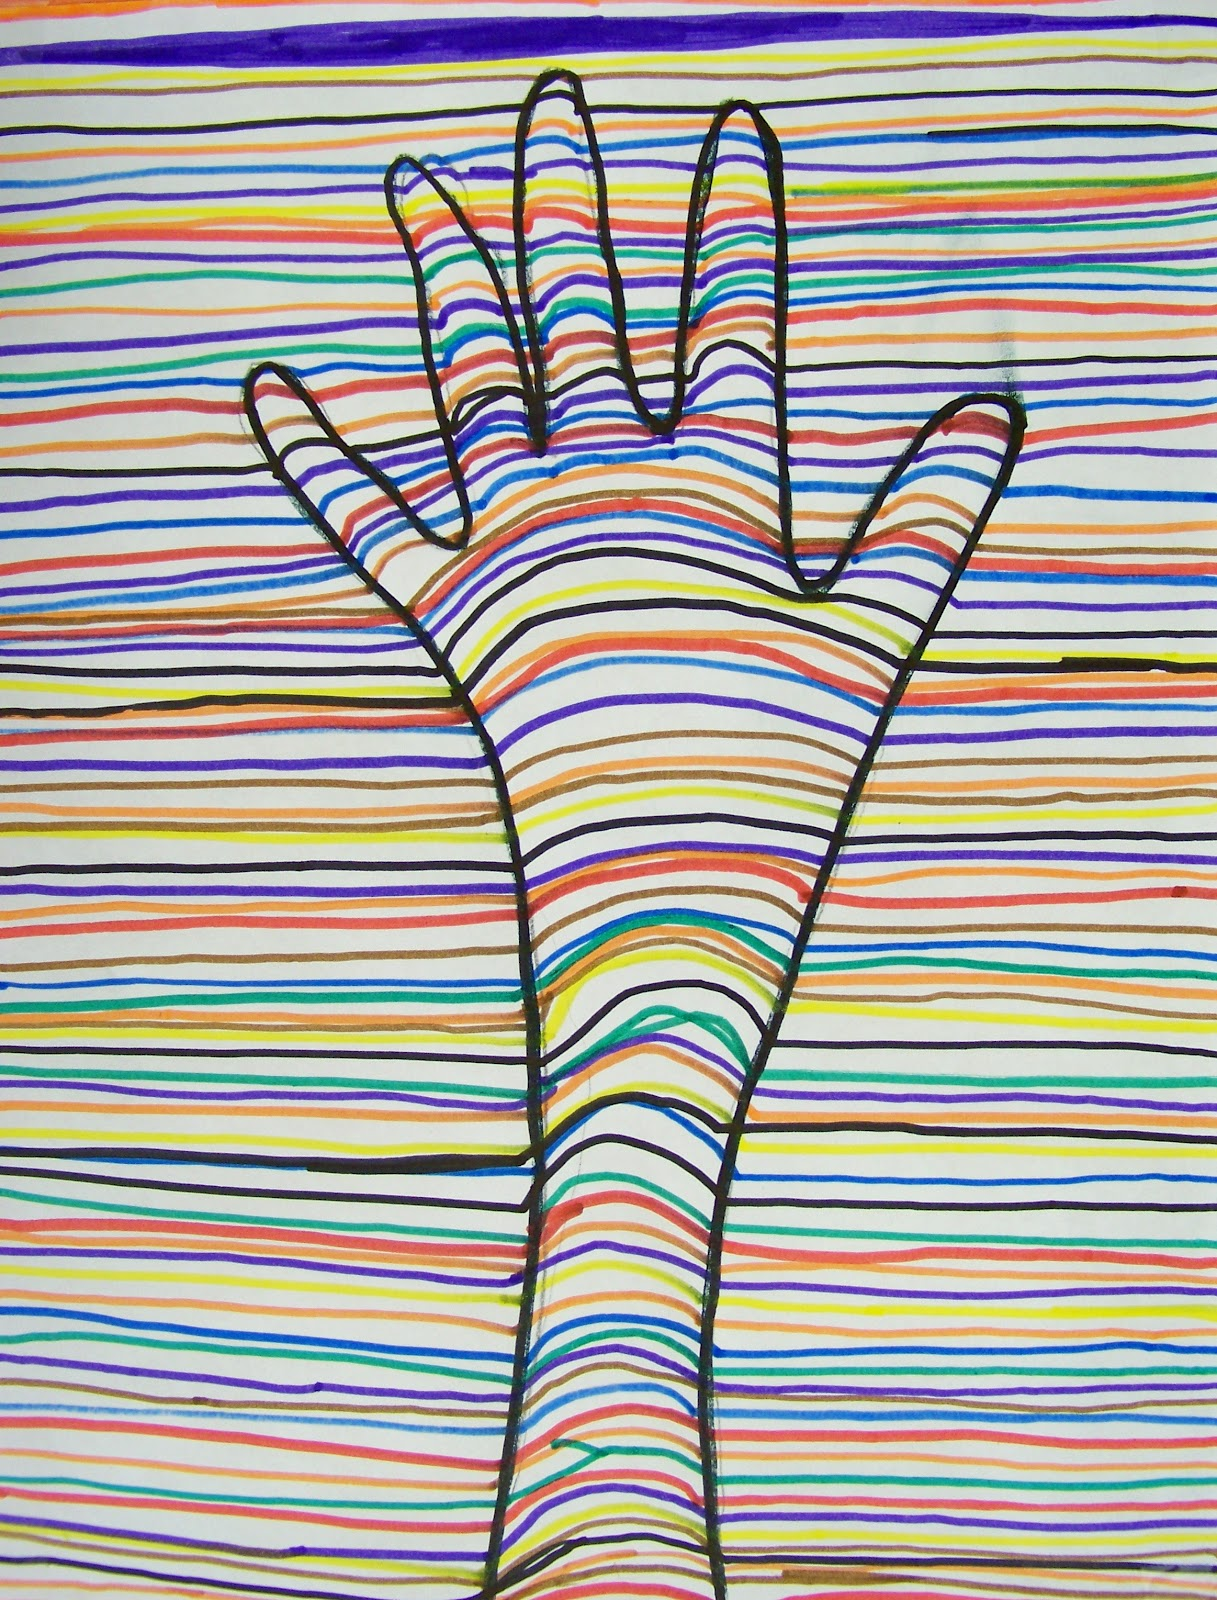 Candice Ashment Art Illusional Delusional Hand Art